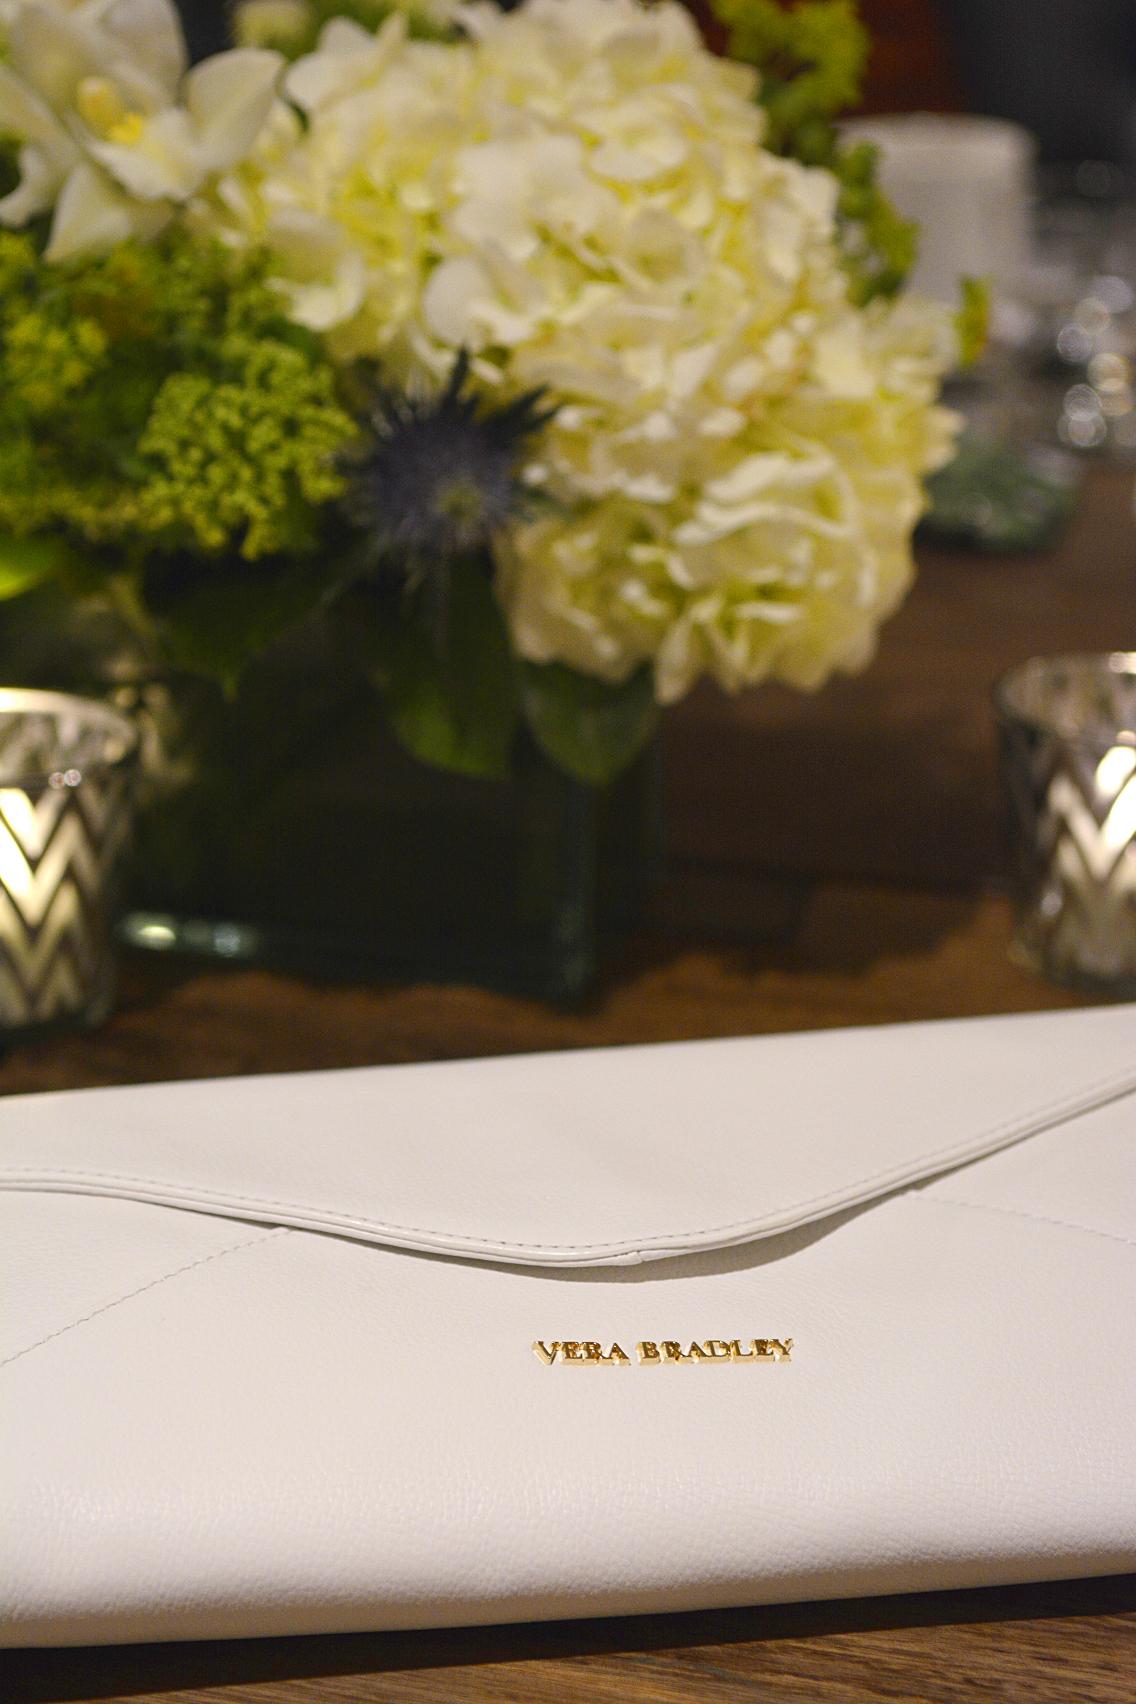 Vera Bradley Meryl Davis Brunch 2015 10